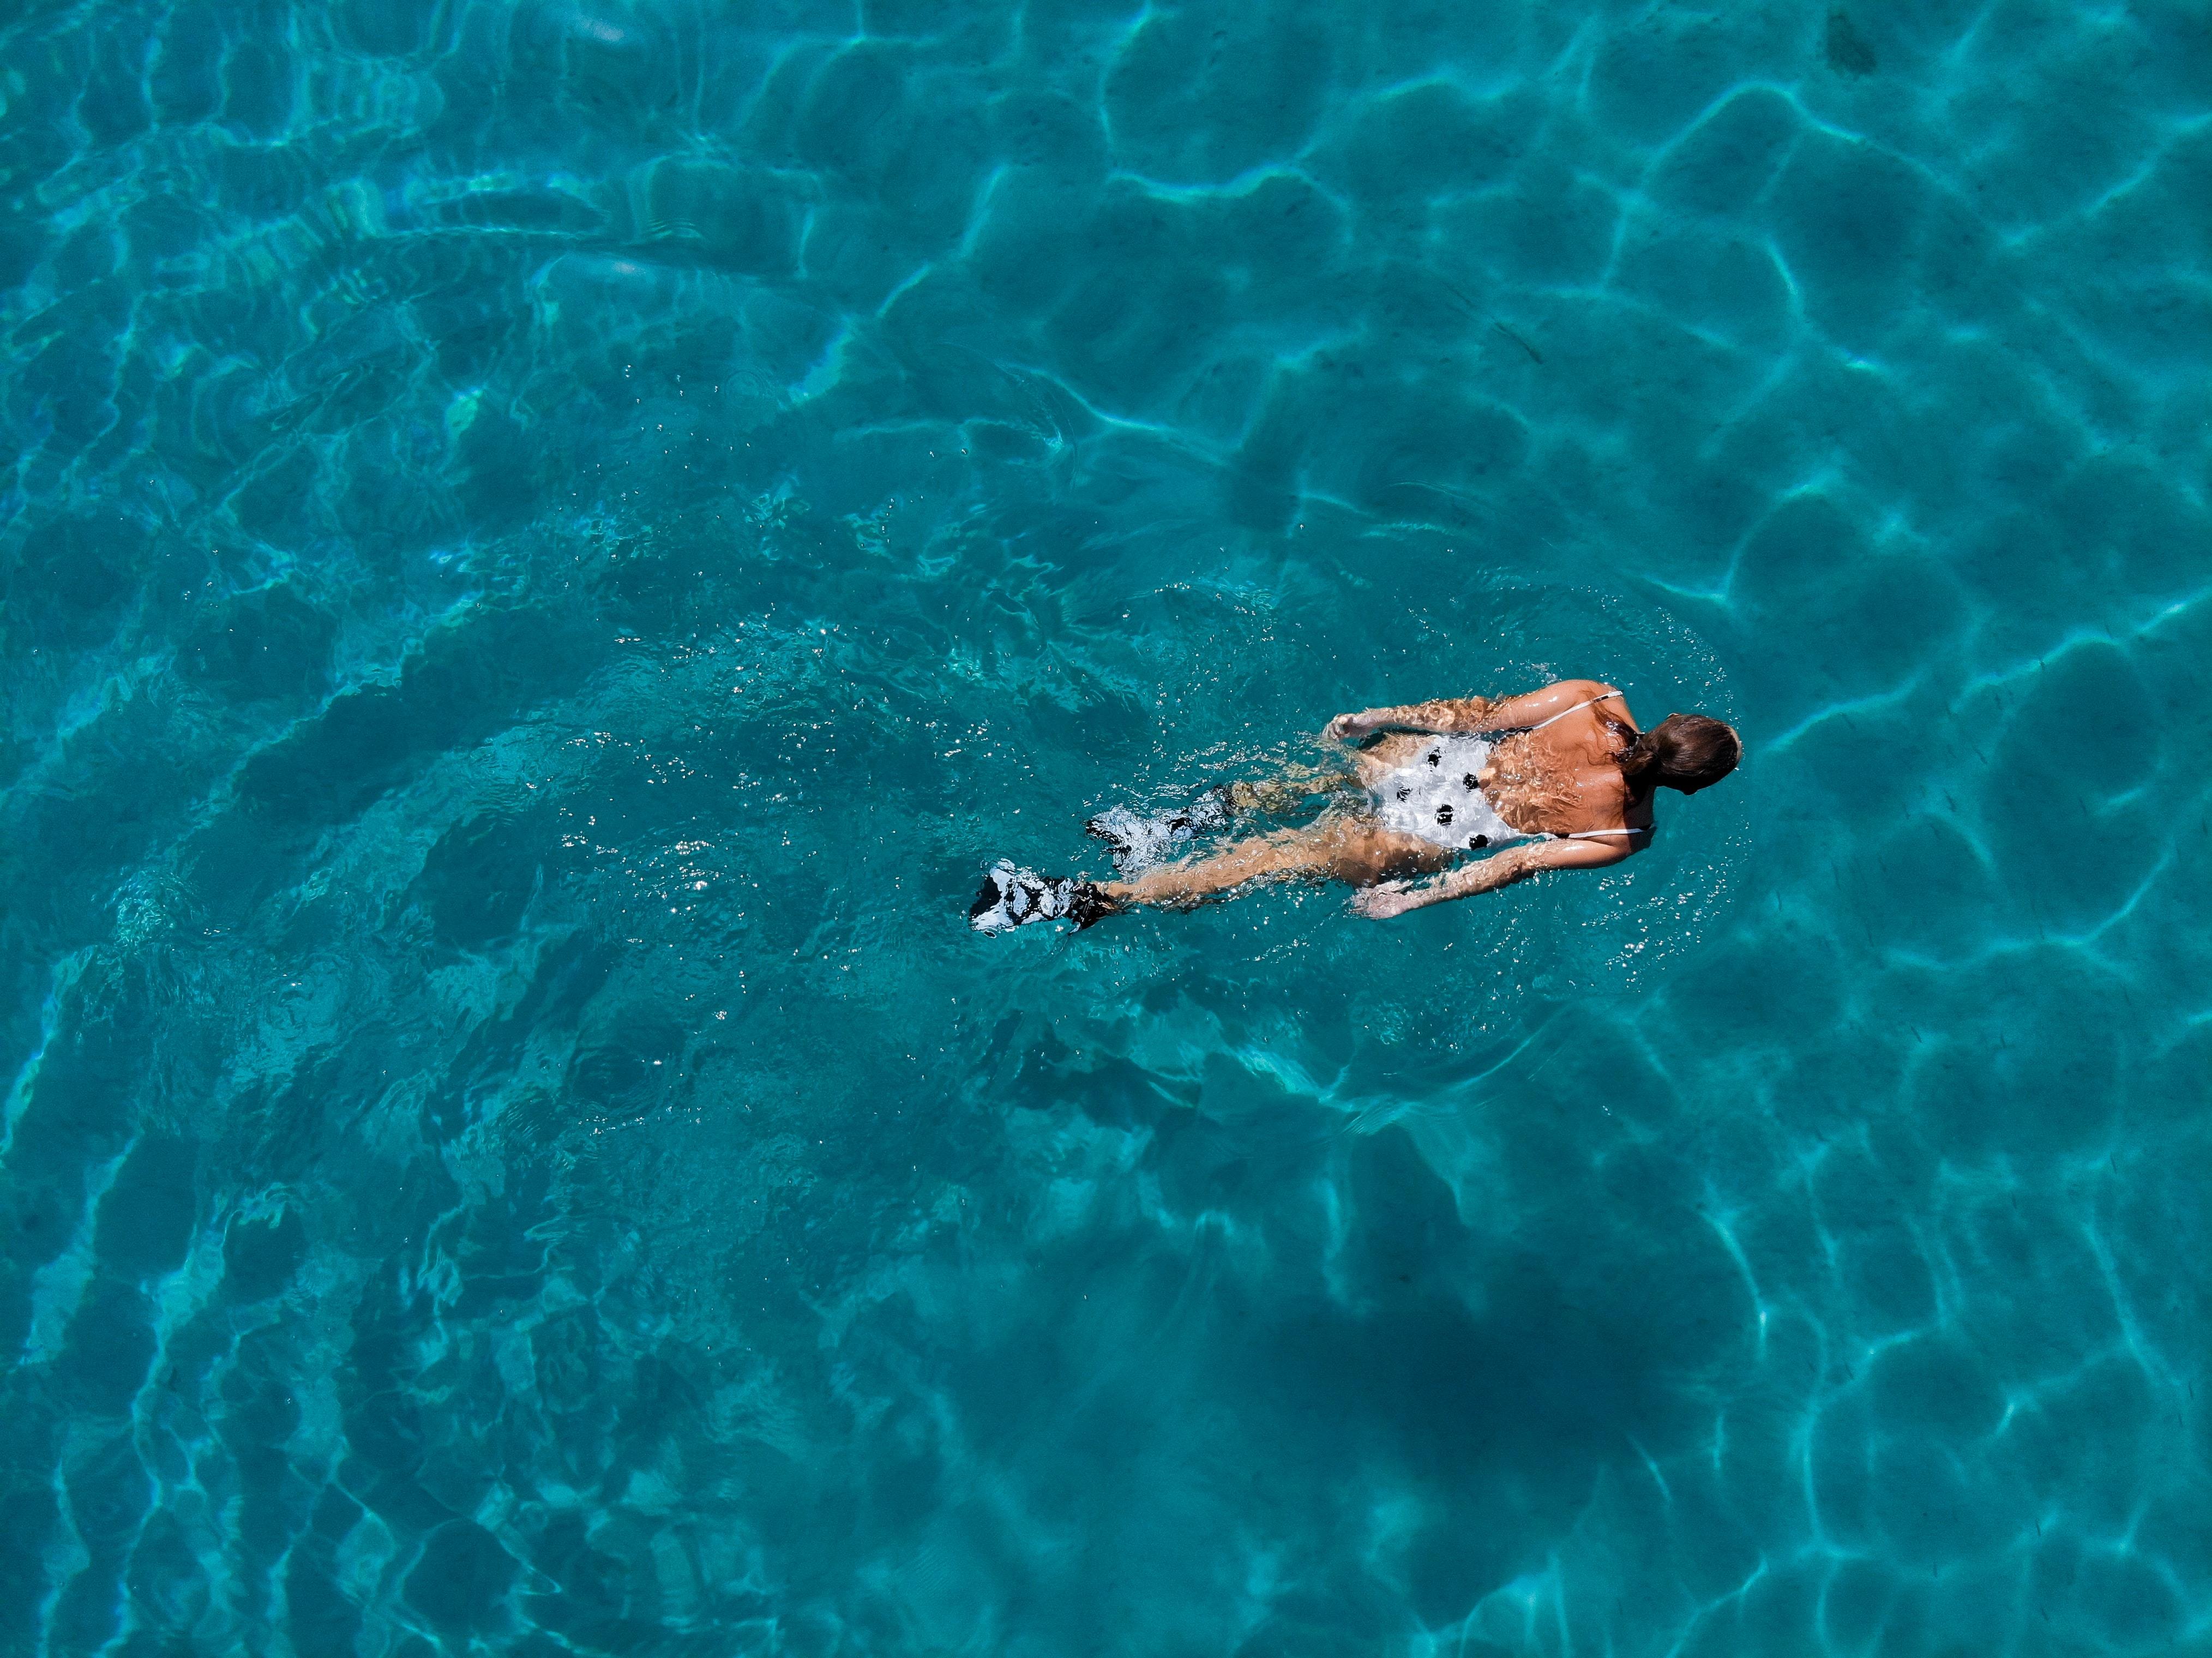 filip filkovic philatz YivSbcIL fk unsplash - Find det rigtige svømmeudstyr